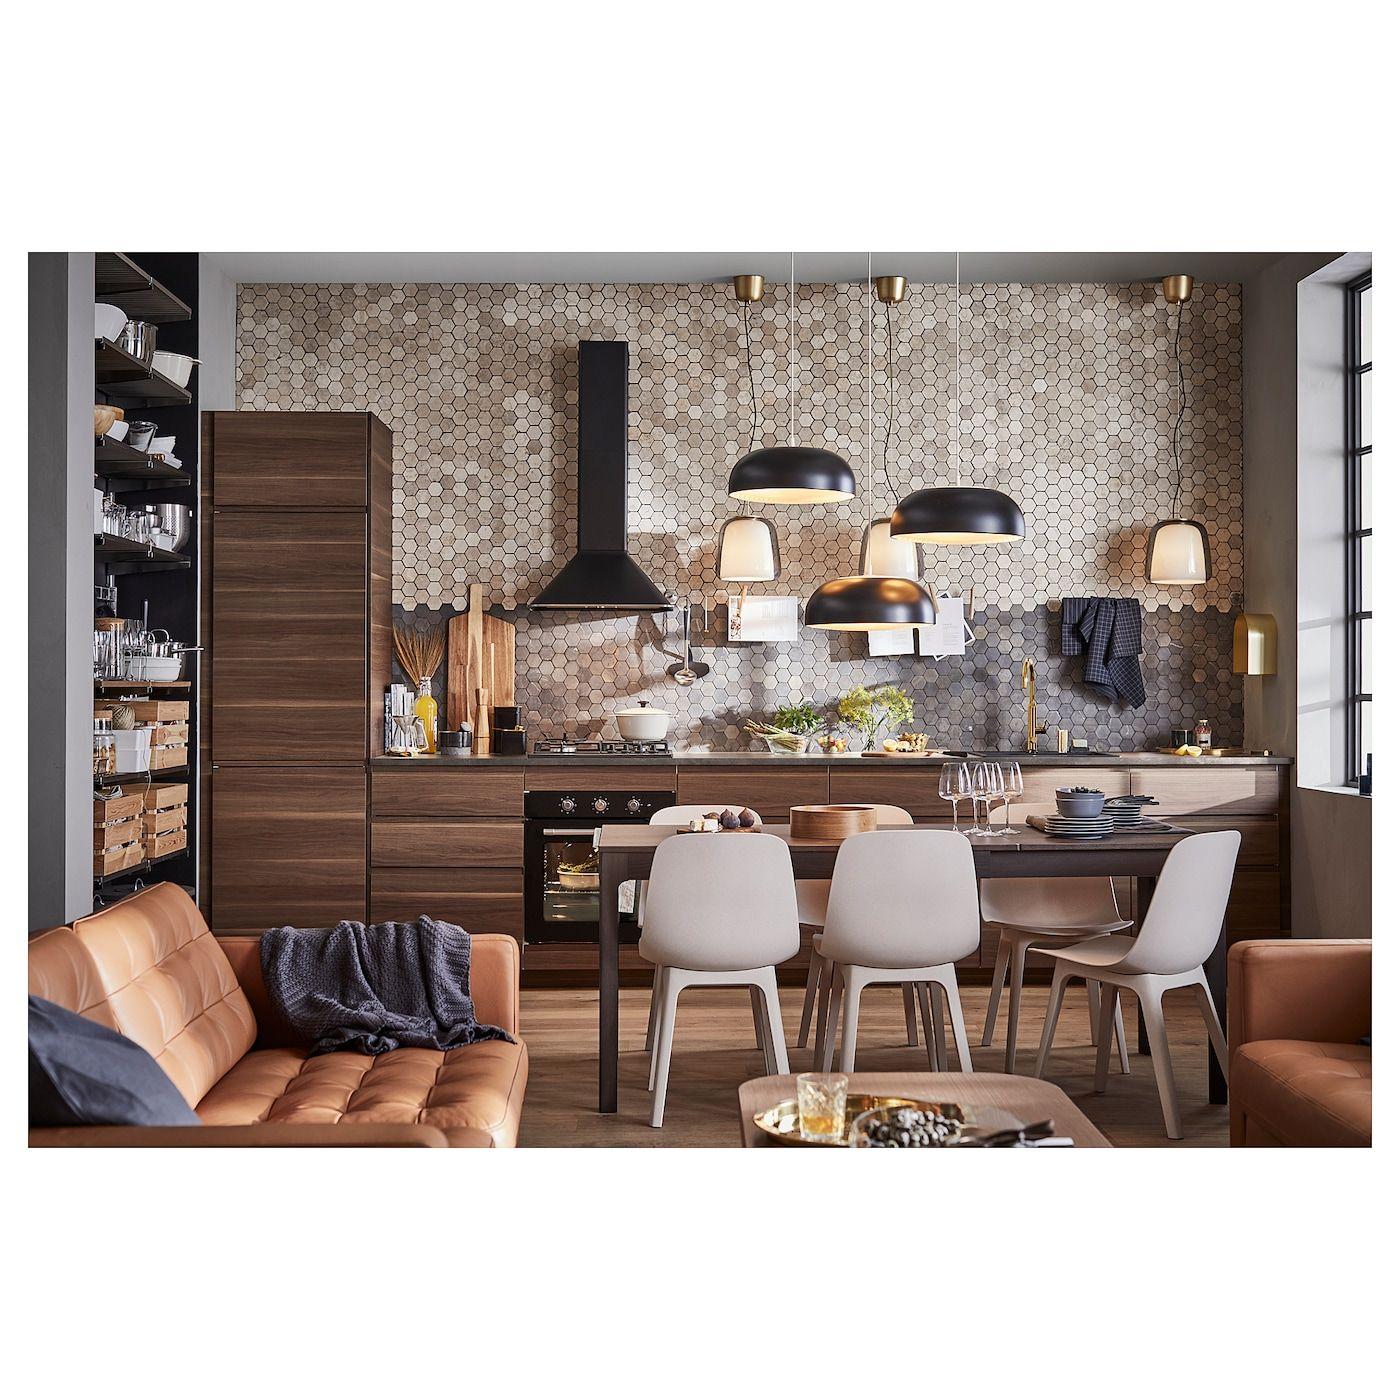 Ekbacken Arbeitsplatte Betonmuster Laminat Ikea Osterreich In 2020 Laminate Countertops Ikea Countertops